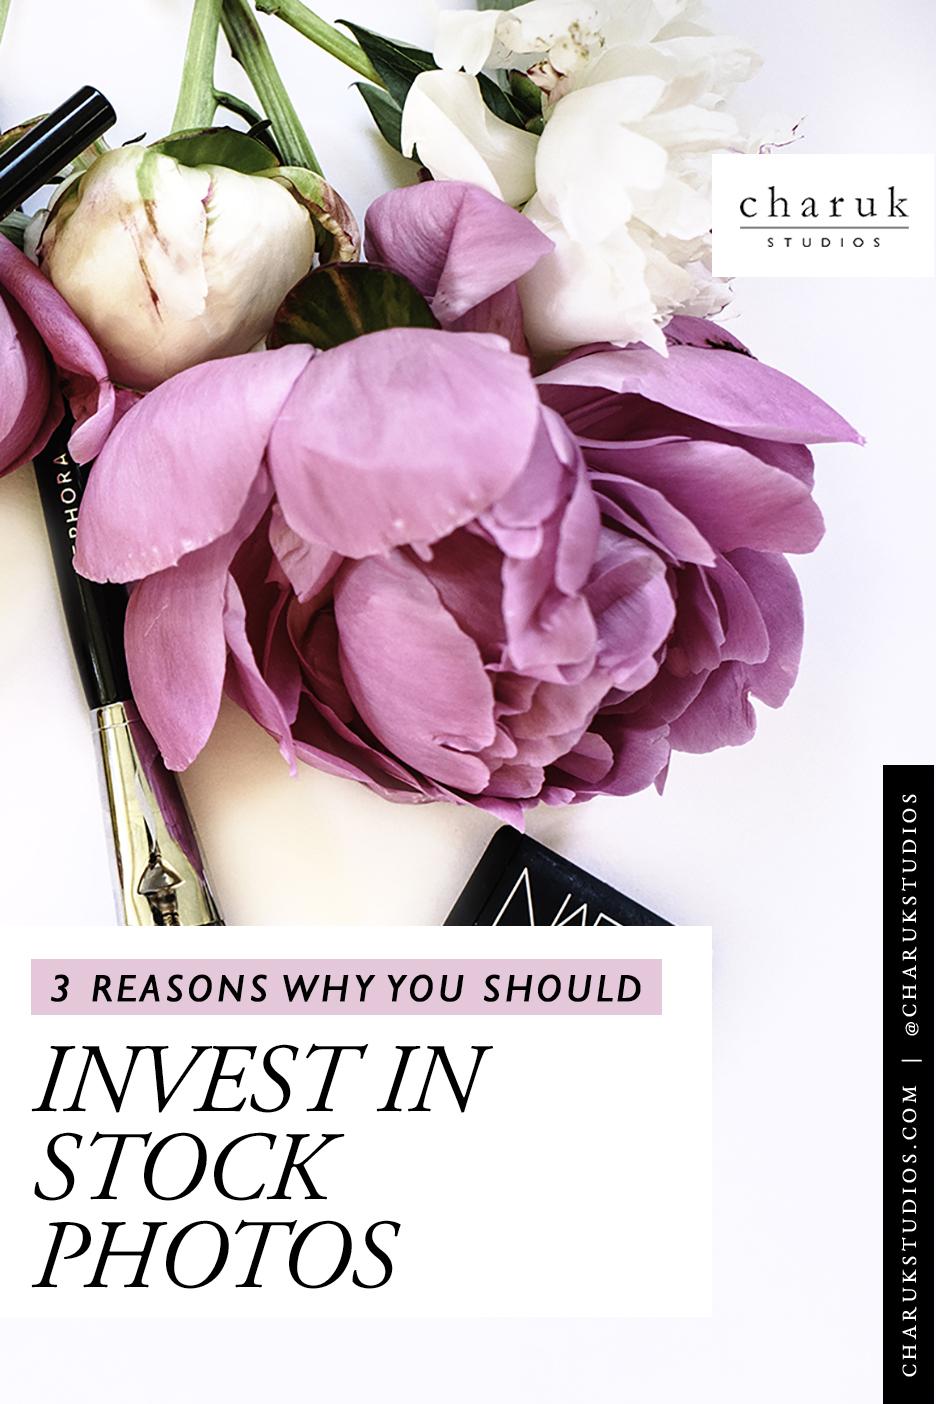 Invest in stock photos.jpg